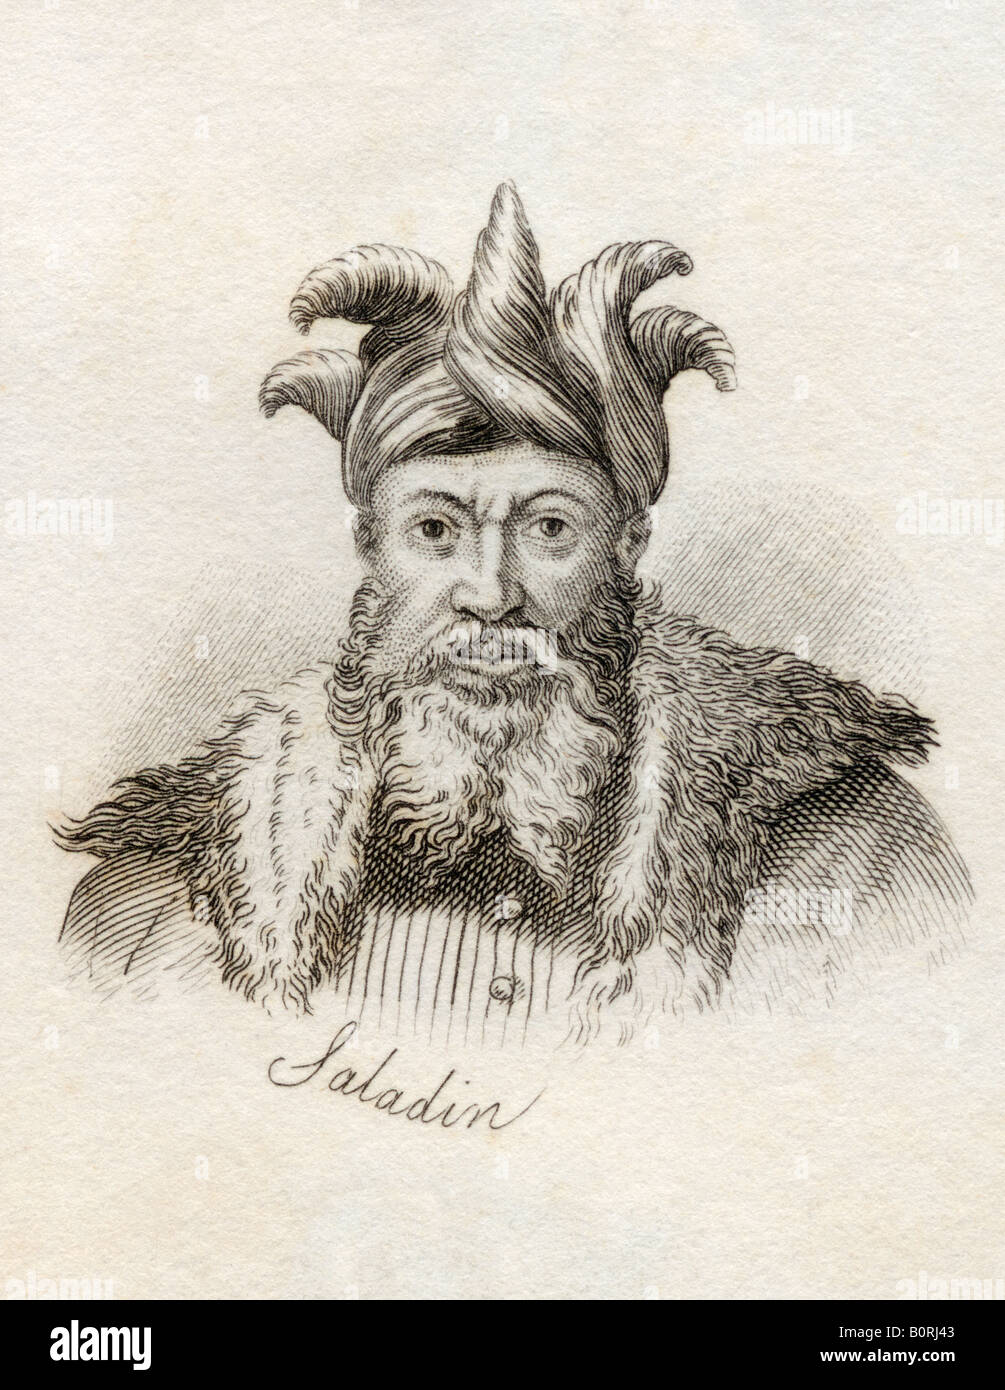 Salah ad Din Yusuf ibn Ayyub Saladin 1137 1193AD Sultan of Egypt and Syria Muslim - Stock Image